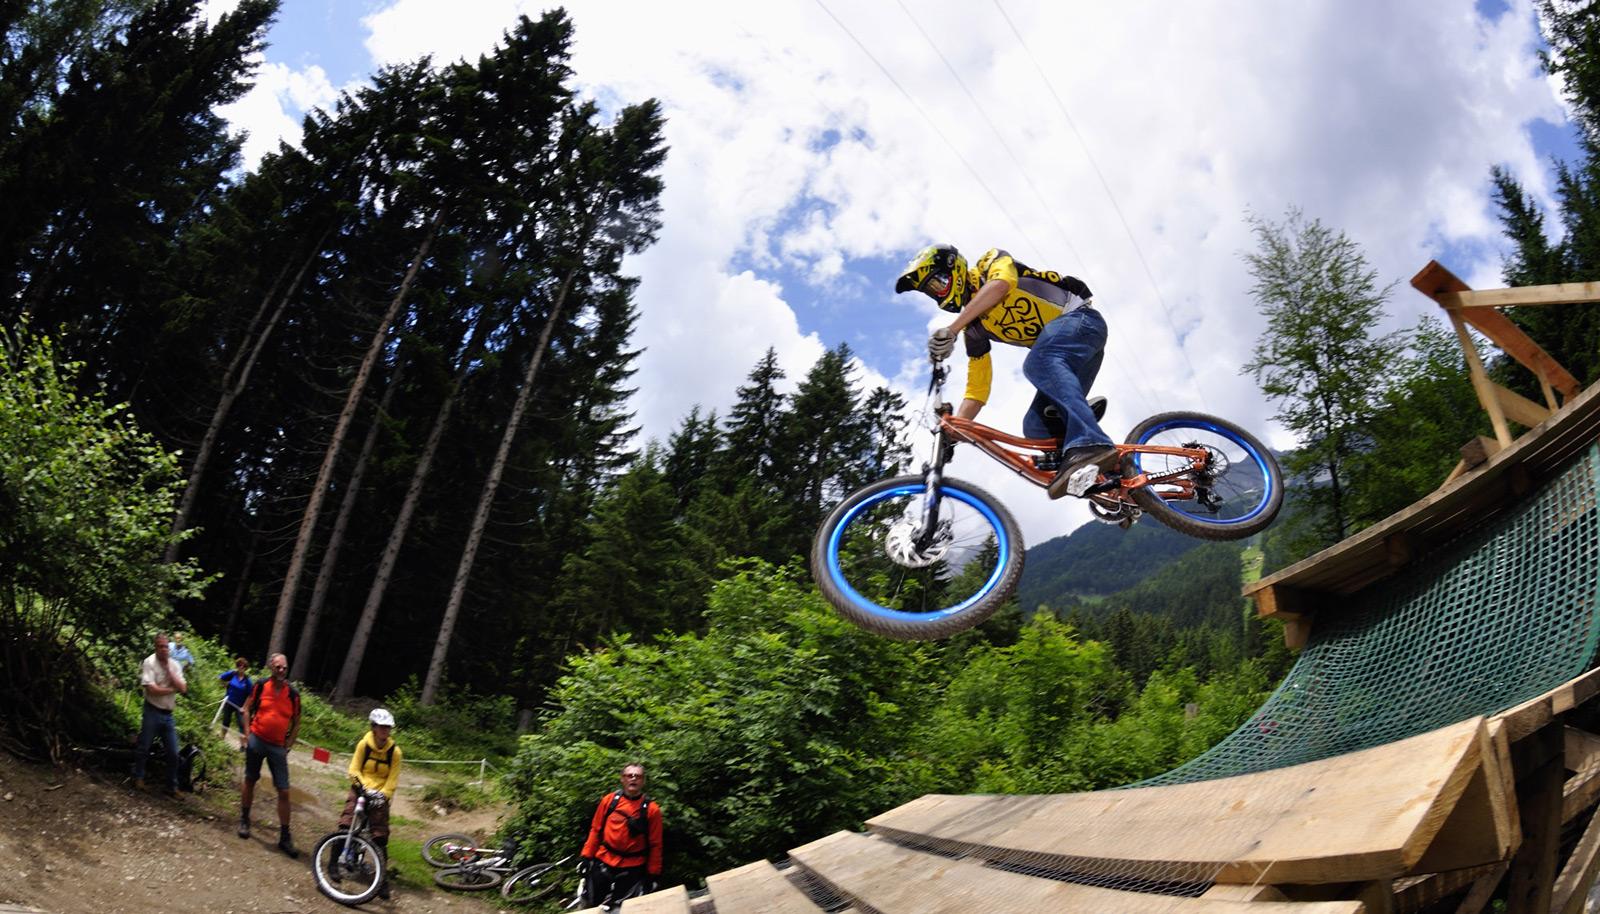 Österreich Urlaub: Tirol: Tirol Urlaub